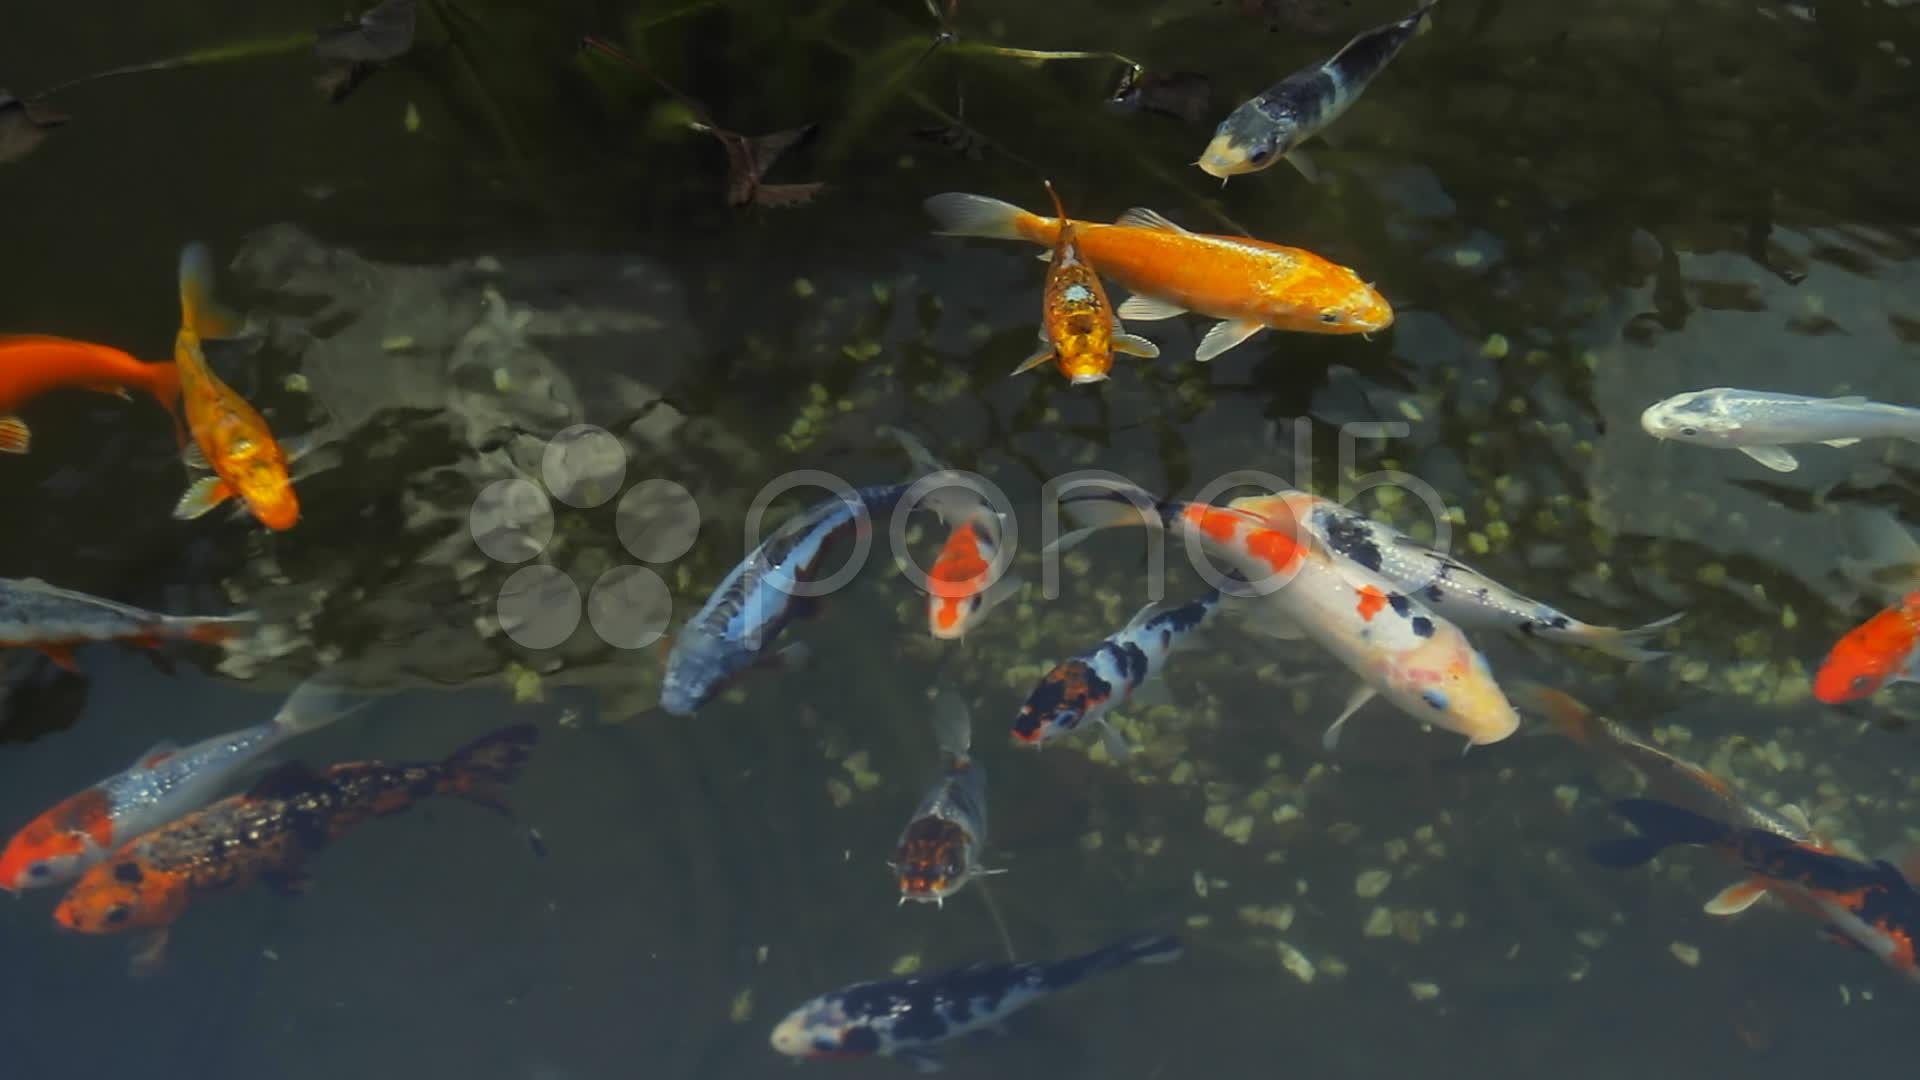 Koi fish pond overhead view hd stock video 10739605 for Koi fish to pond ratio